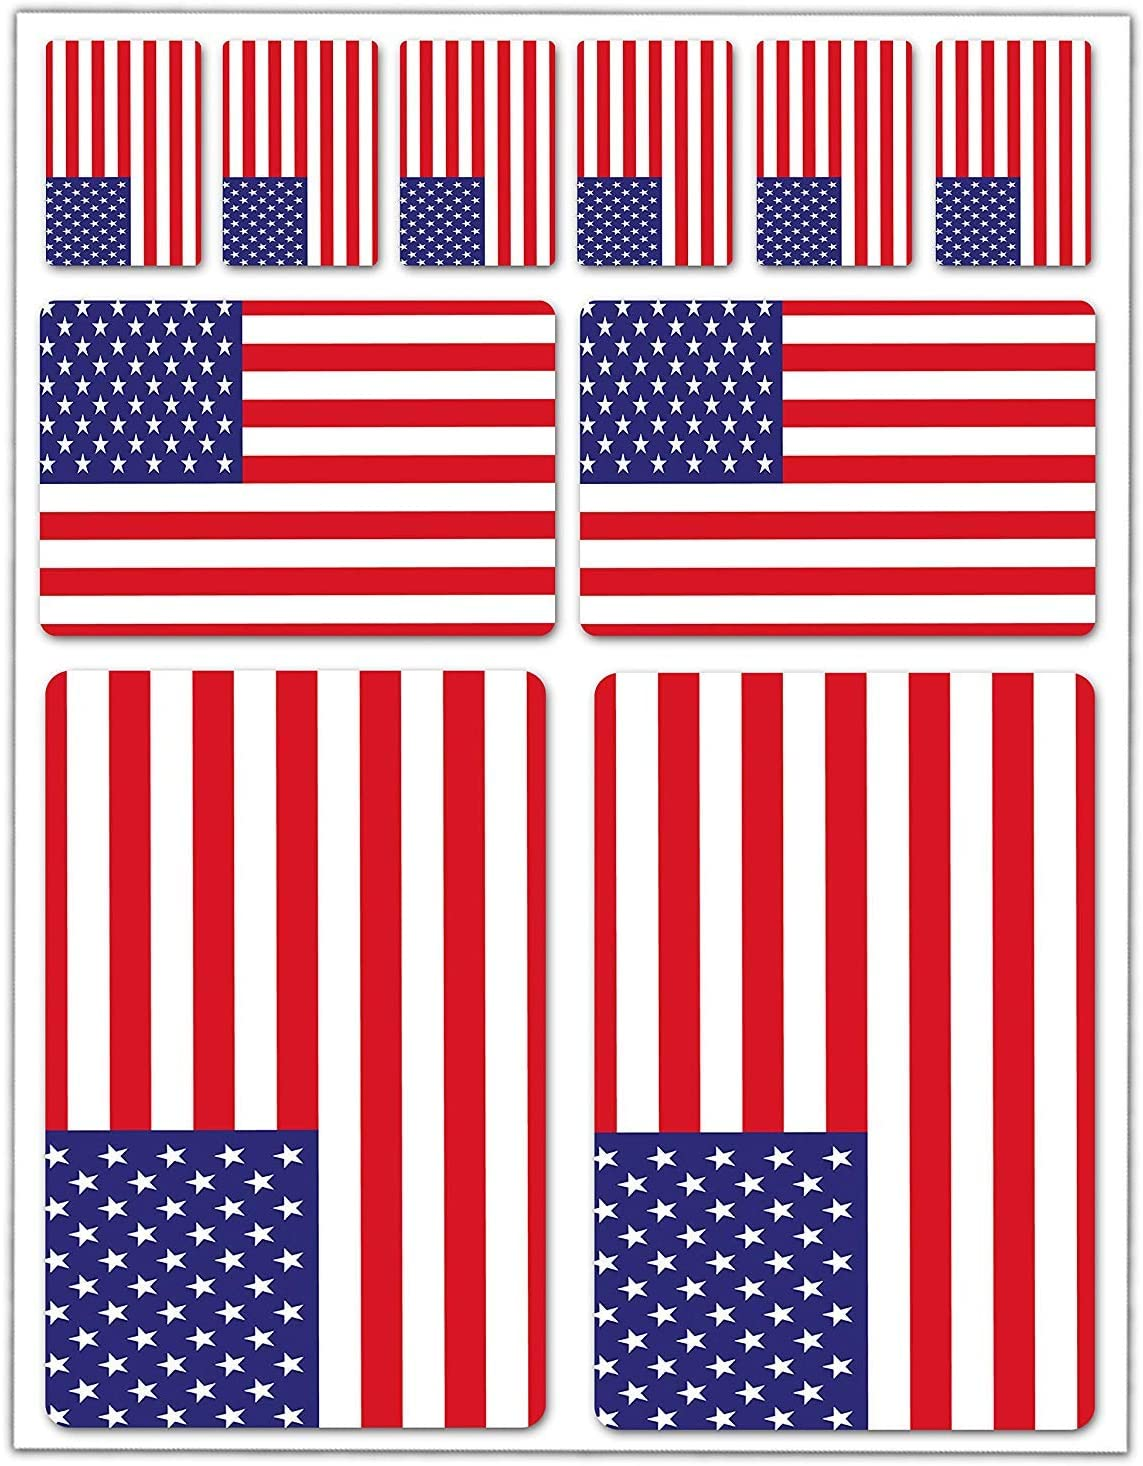 10 x Vinyl Stickers Set Decals USA American National Flag Car Motorcycle Helmet D 39